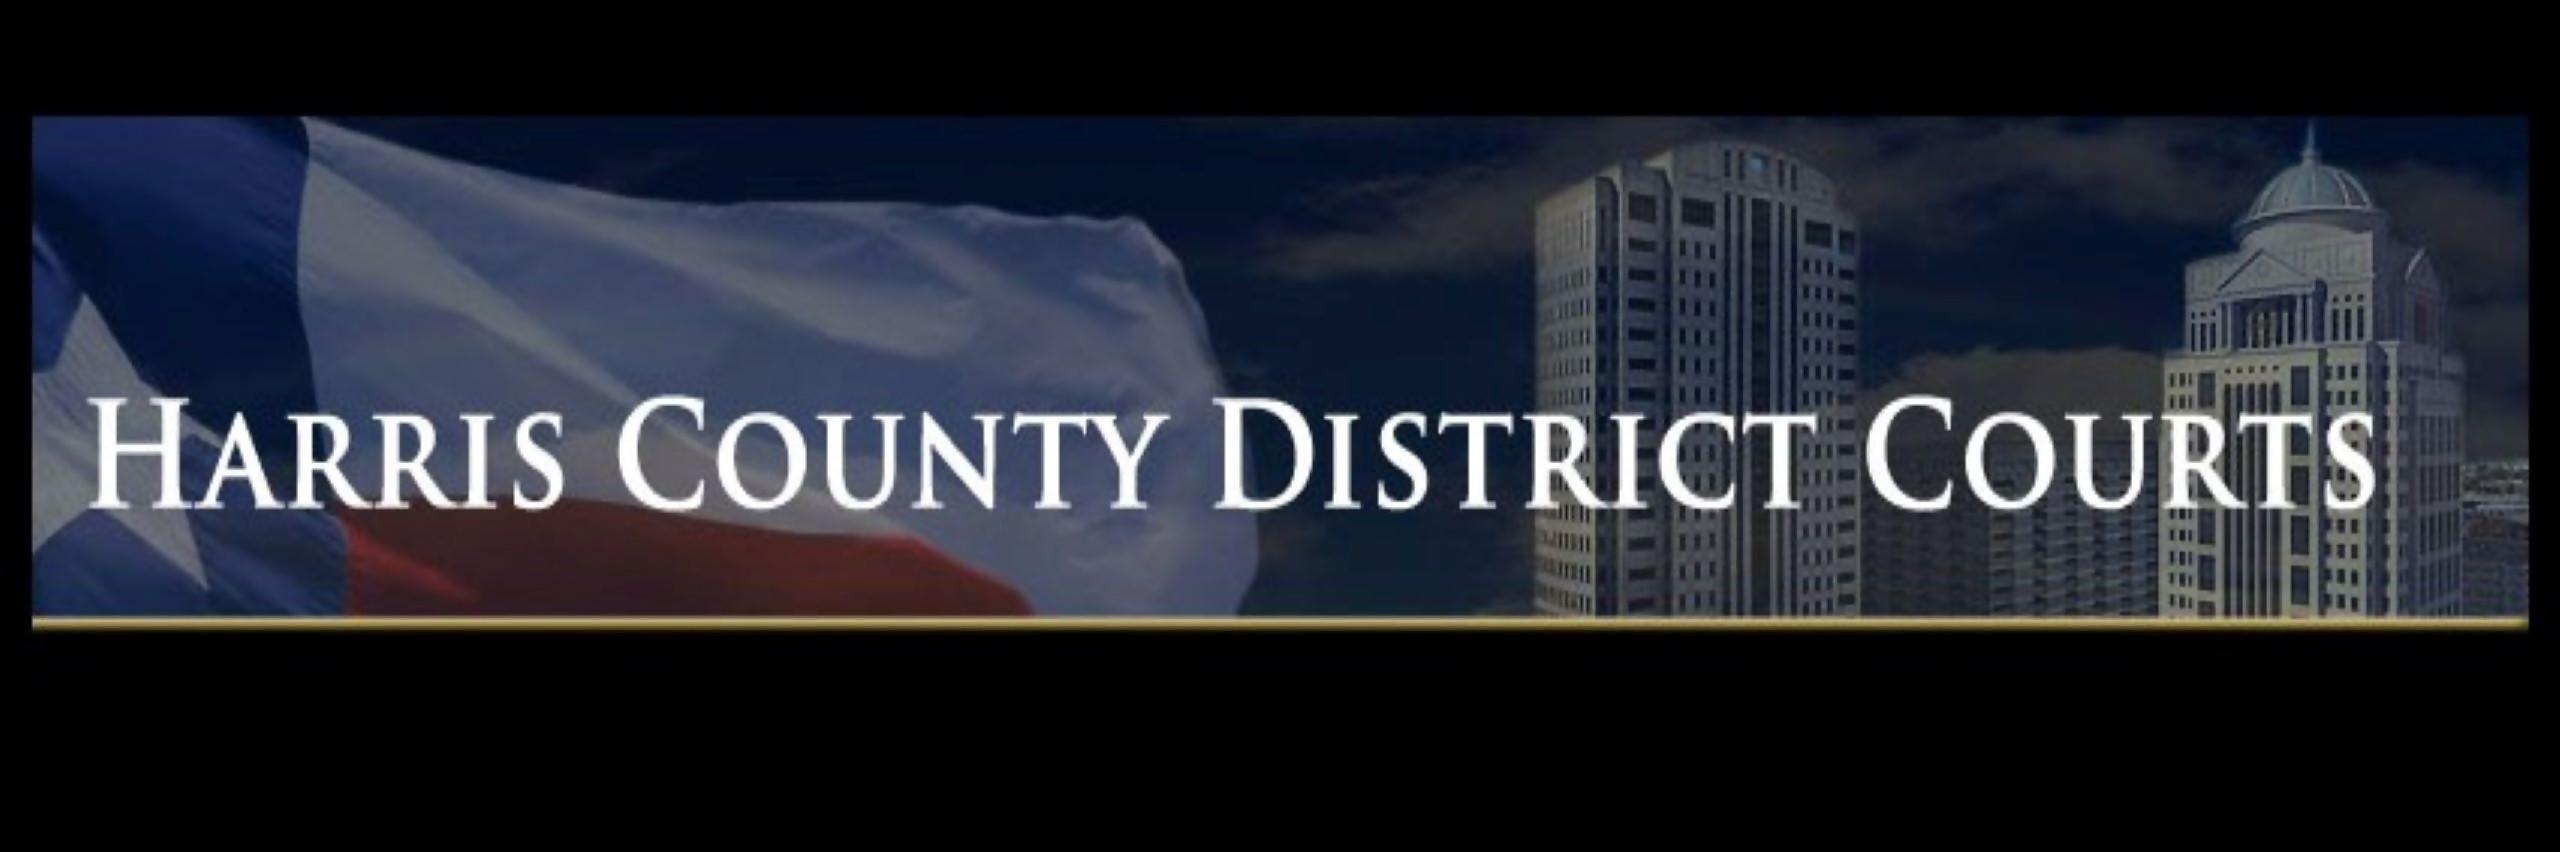 165th District Court - Live Stream